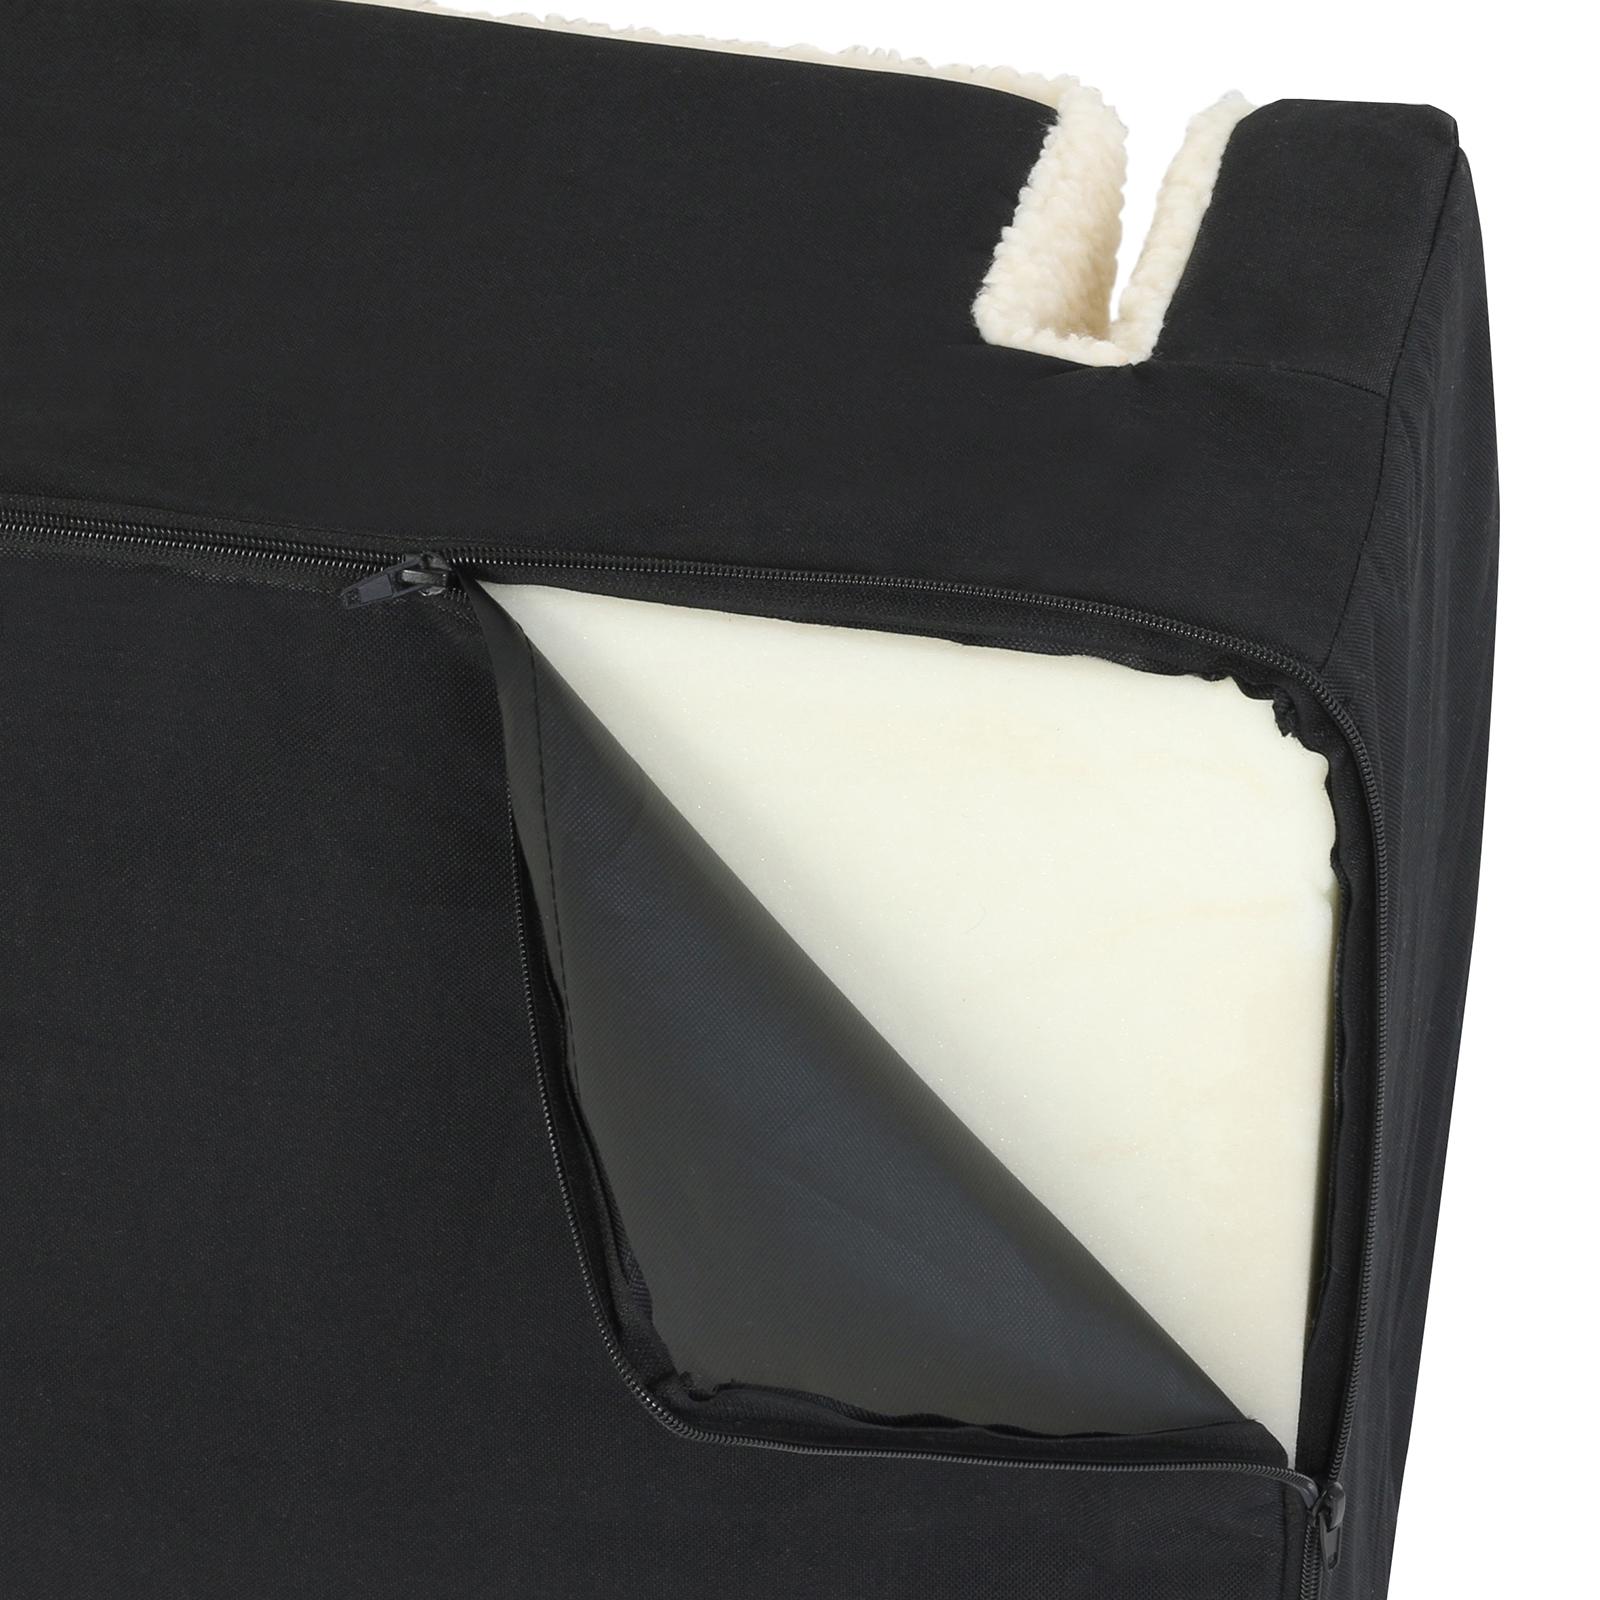 me my pets autositz kissen korb f r haustiere hunde katz. Black Bedroom Furniture Sets. Home Design Ideas